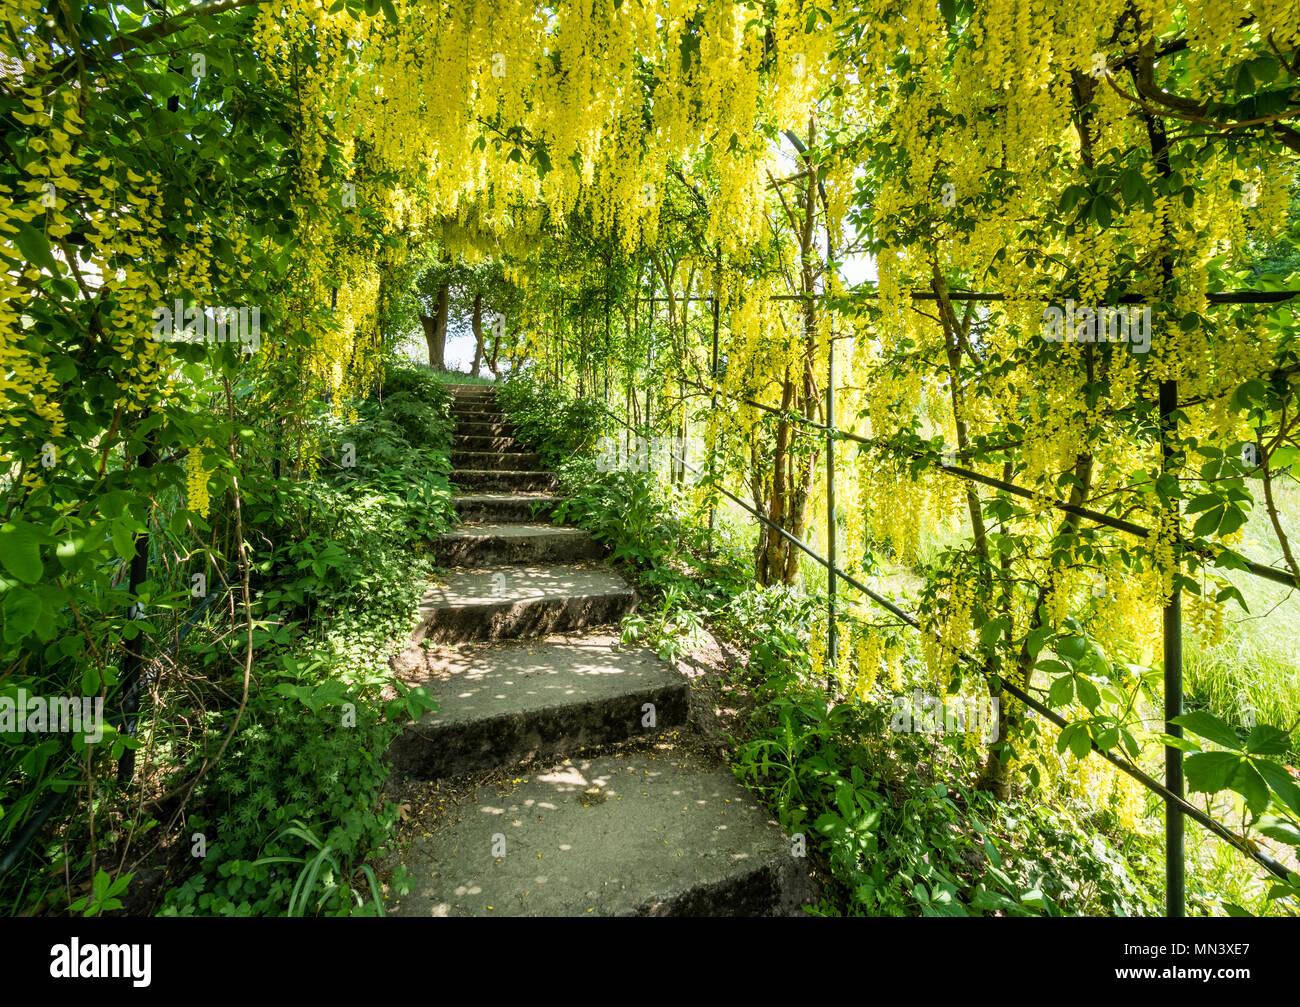 Passage covered by Golden rain, Laburnum anagyroides, garden 'Heilpflanzengarten', Celle, Germany Stock Photo